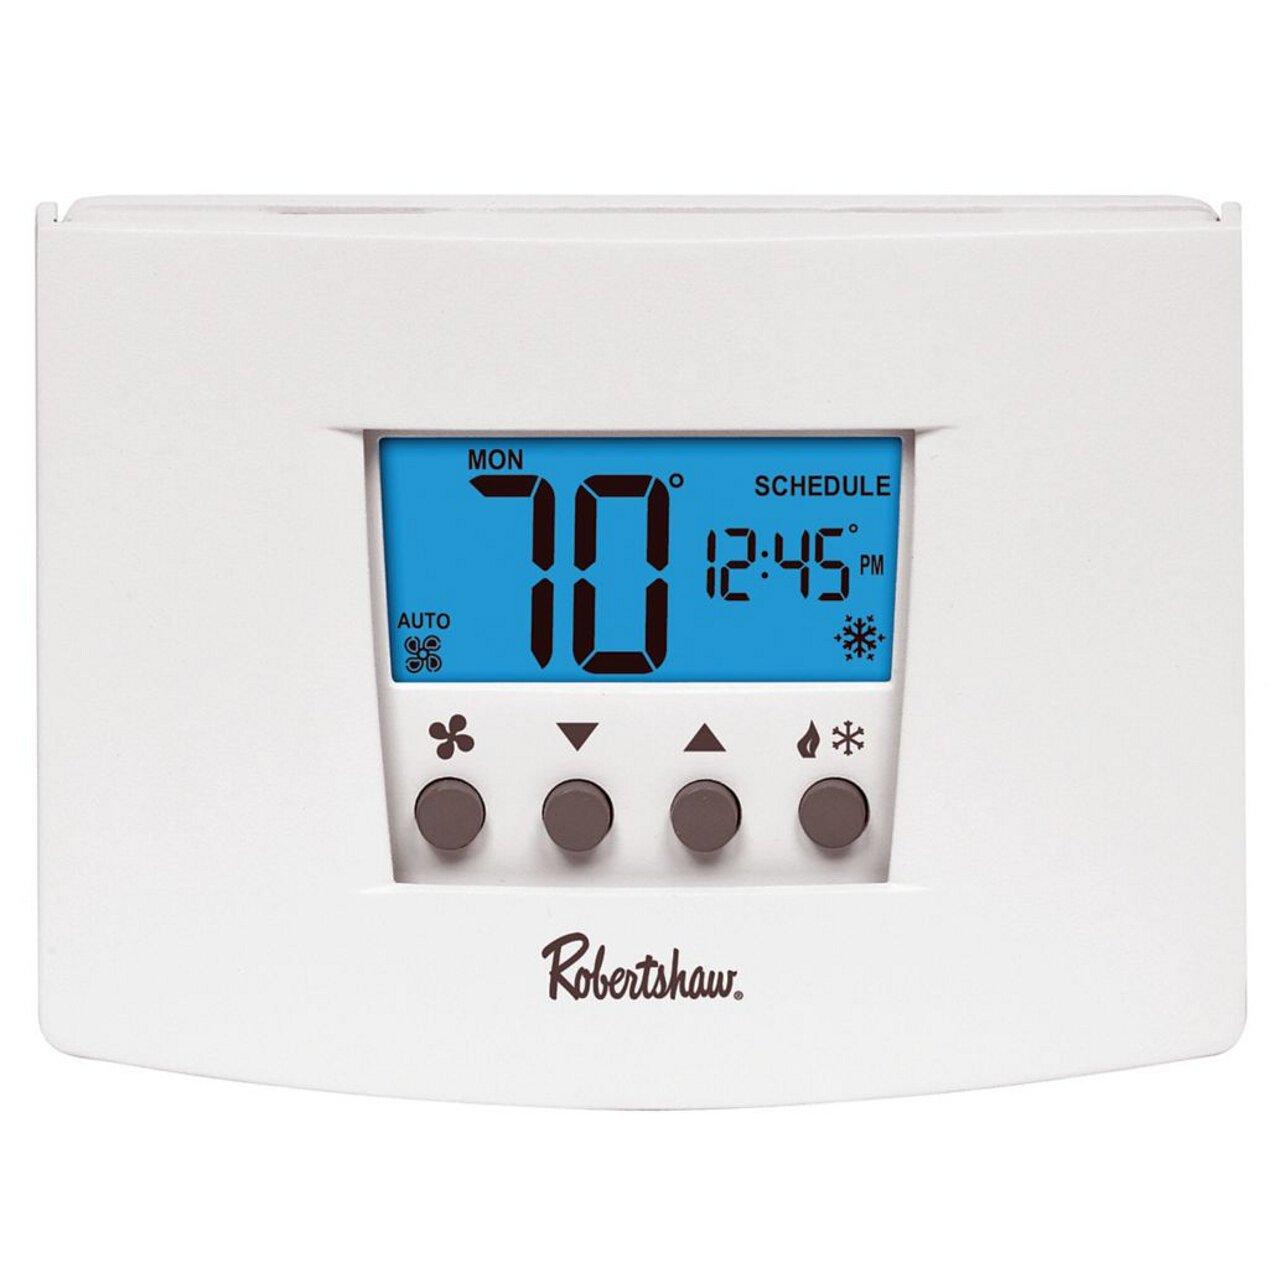 robertshaw 9600 thermostat wiring diagram robertshaw gas valve wiring diagram wiring diagram Maple Chase Thermostat Manual Programmable Thermostat Manual